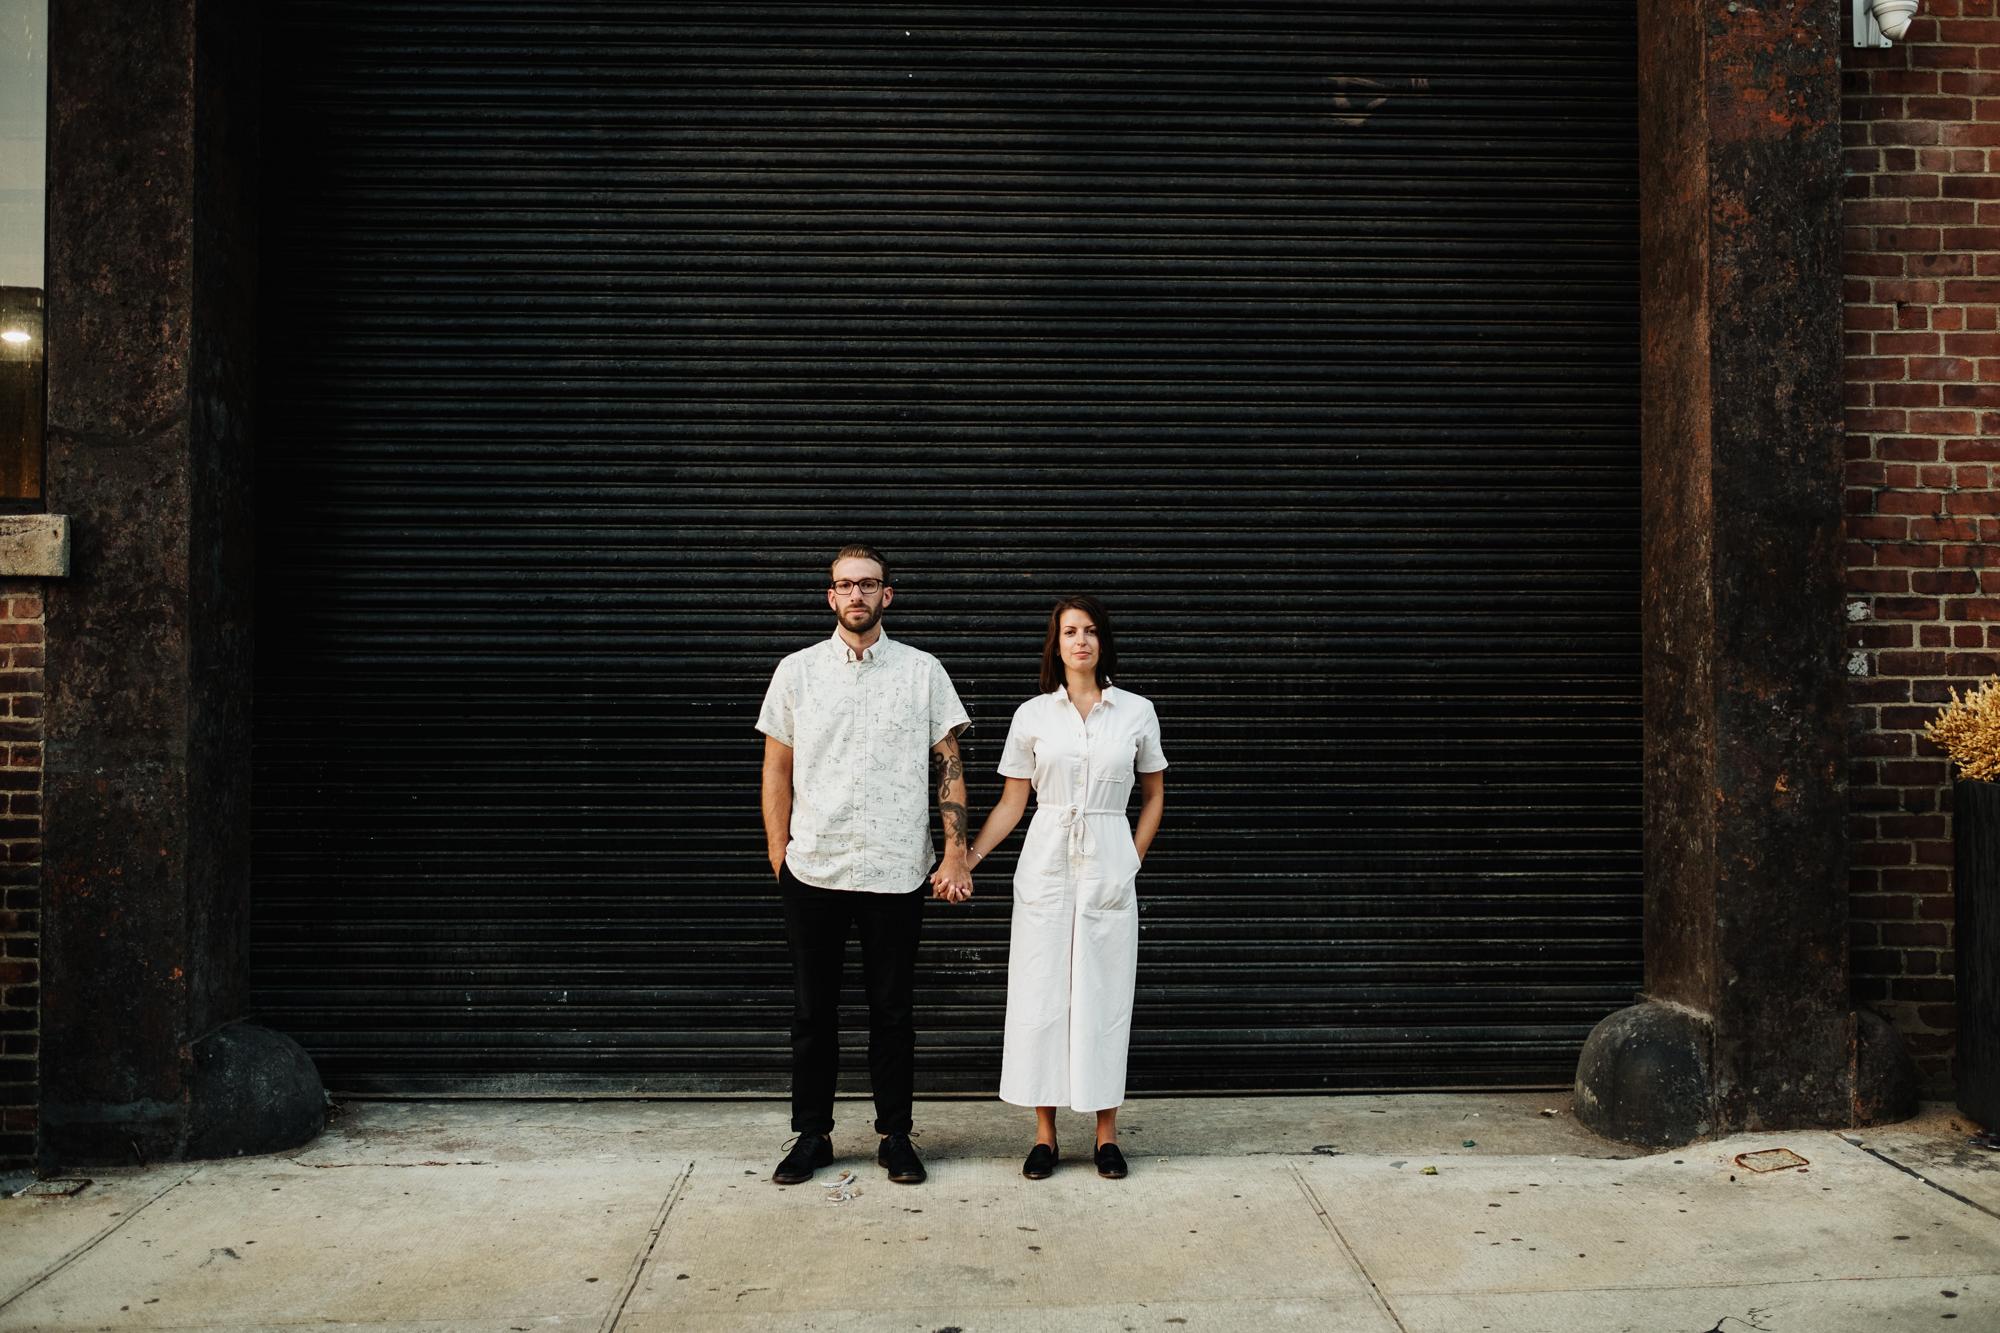 Wedding_Francis_Boucher_Photography_Brooklyn_engagement_2018-46.jpg